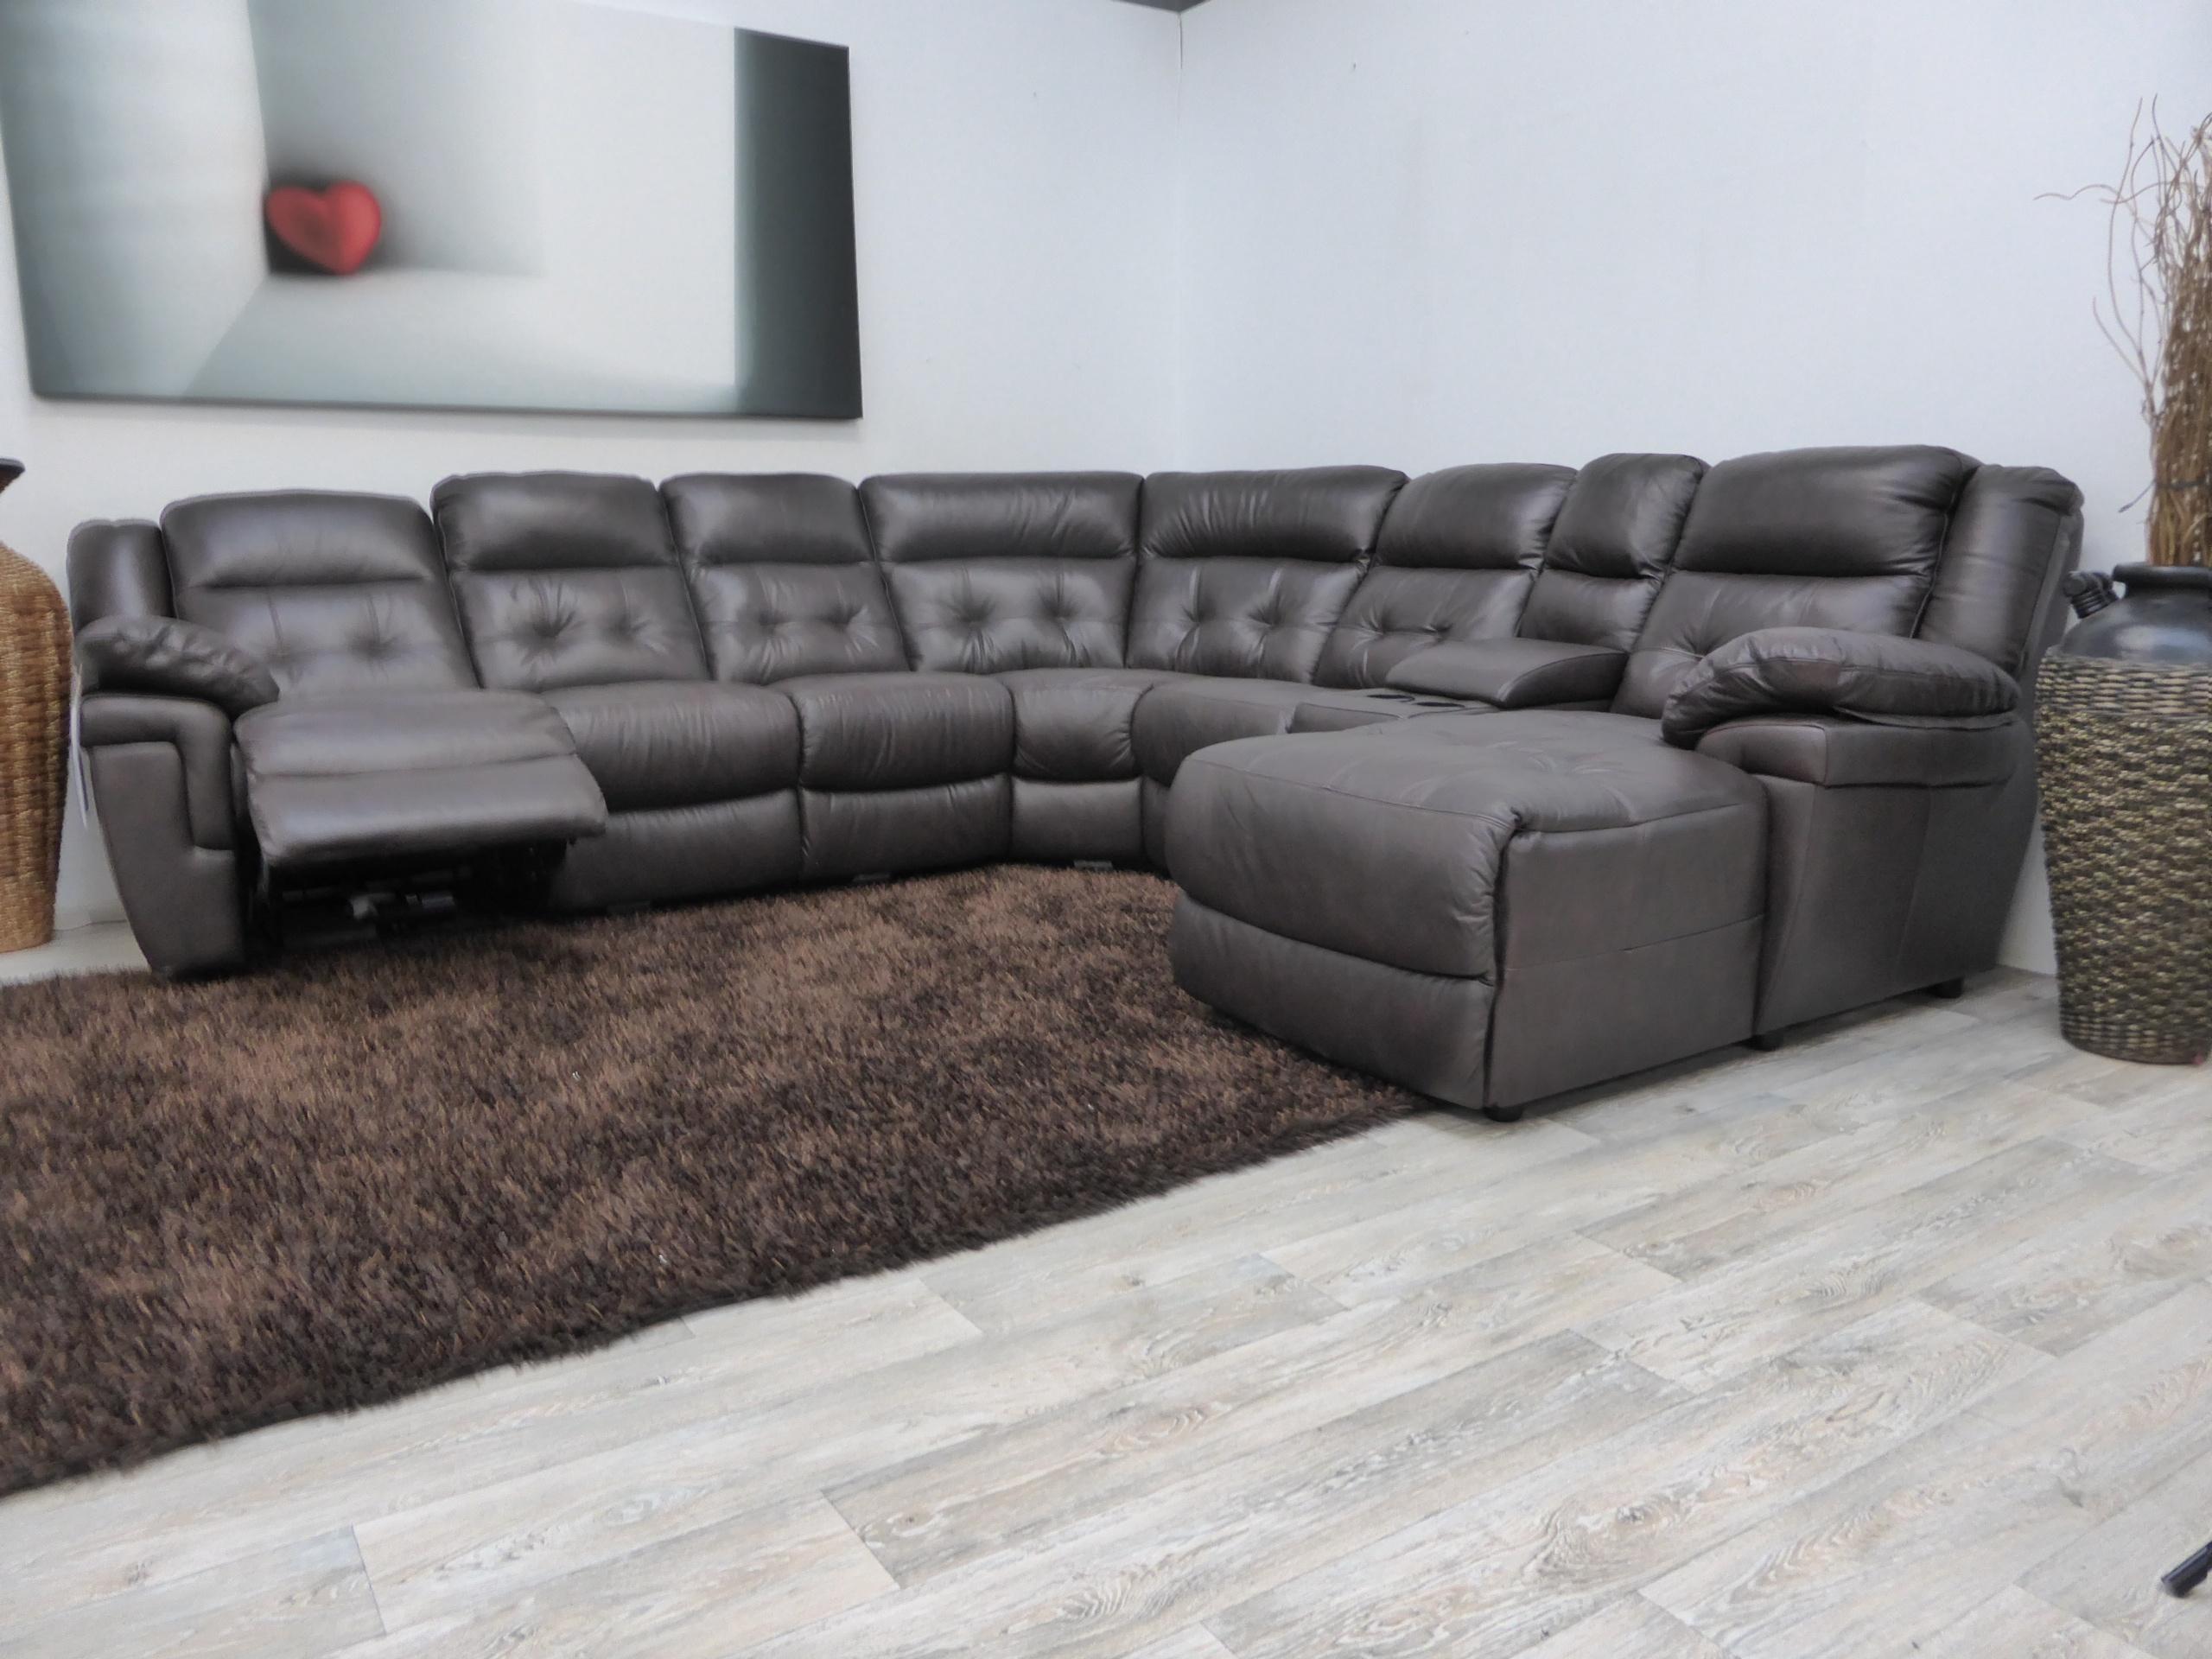 Lay Z Boy Corner Sofa | Tehranmix Decoration In Lazyboy Sectional Sofa (Image 12 of 20)